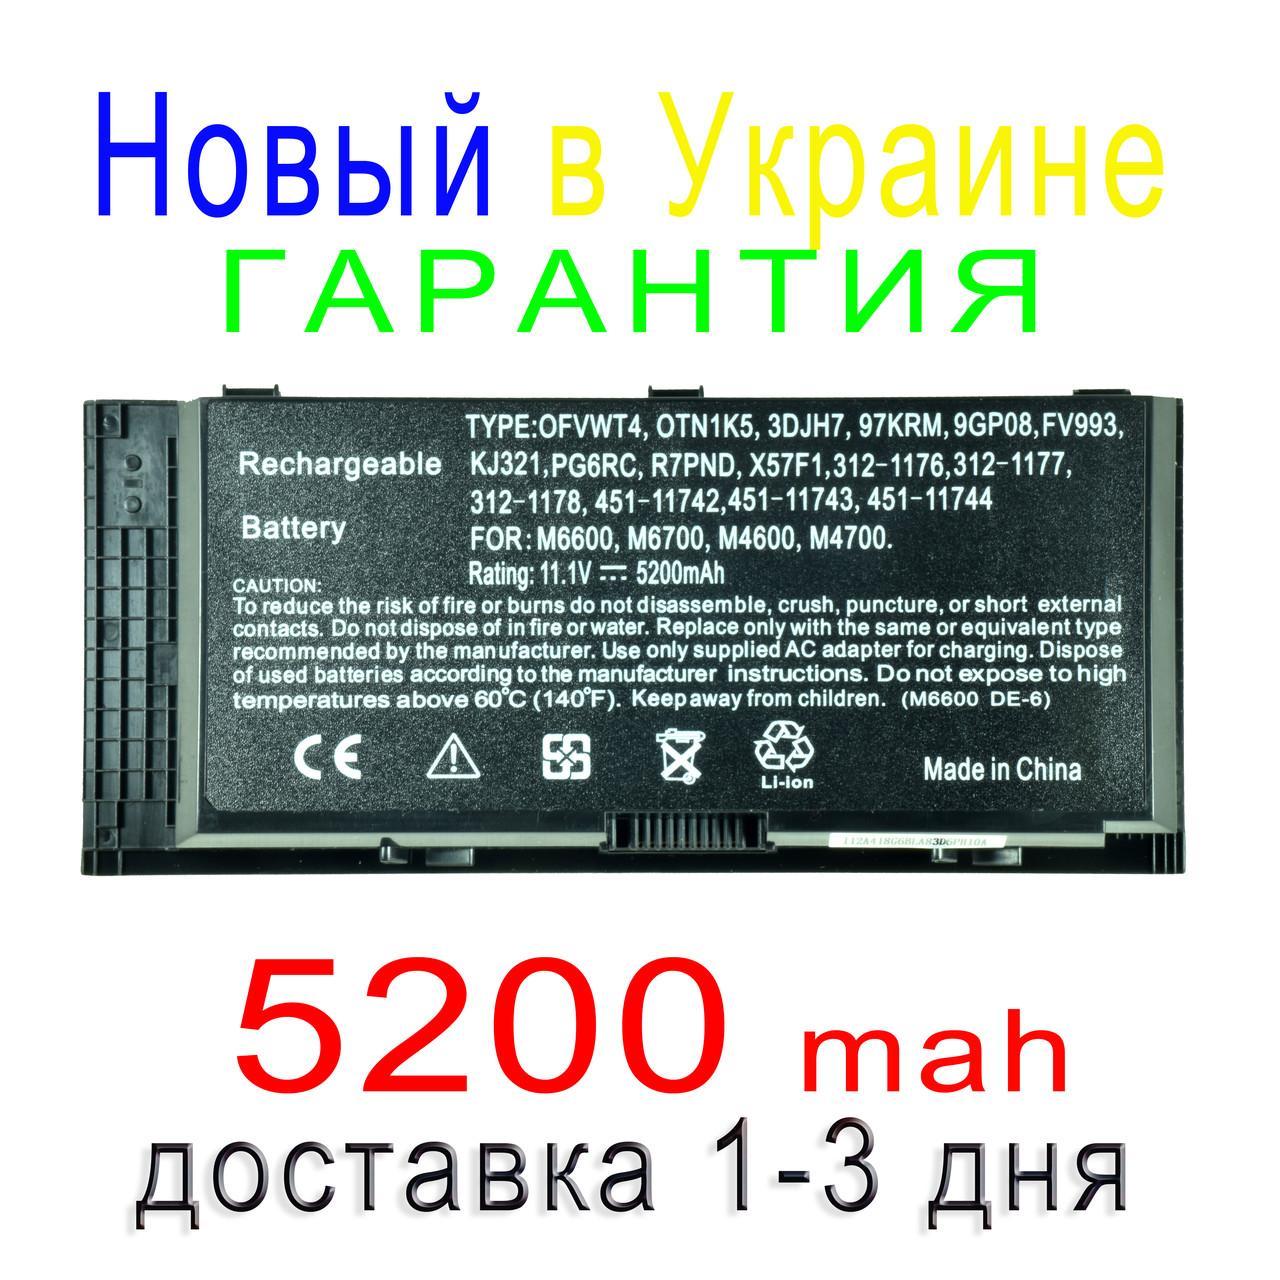 Аккумулятор батарея DELL KJ321 PG6RC R7PND X57F1 312-1176 312-1177 312-1178 451-11742 451-11743